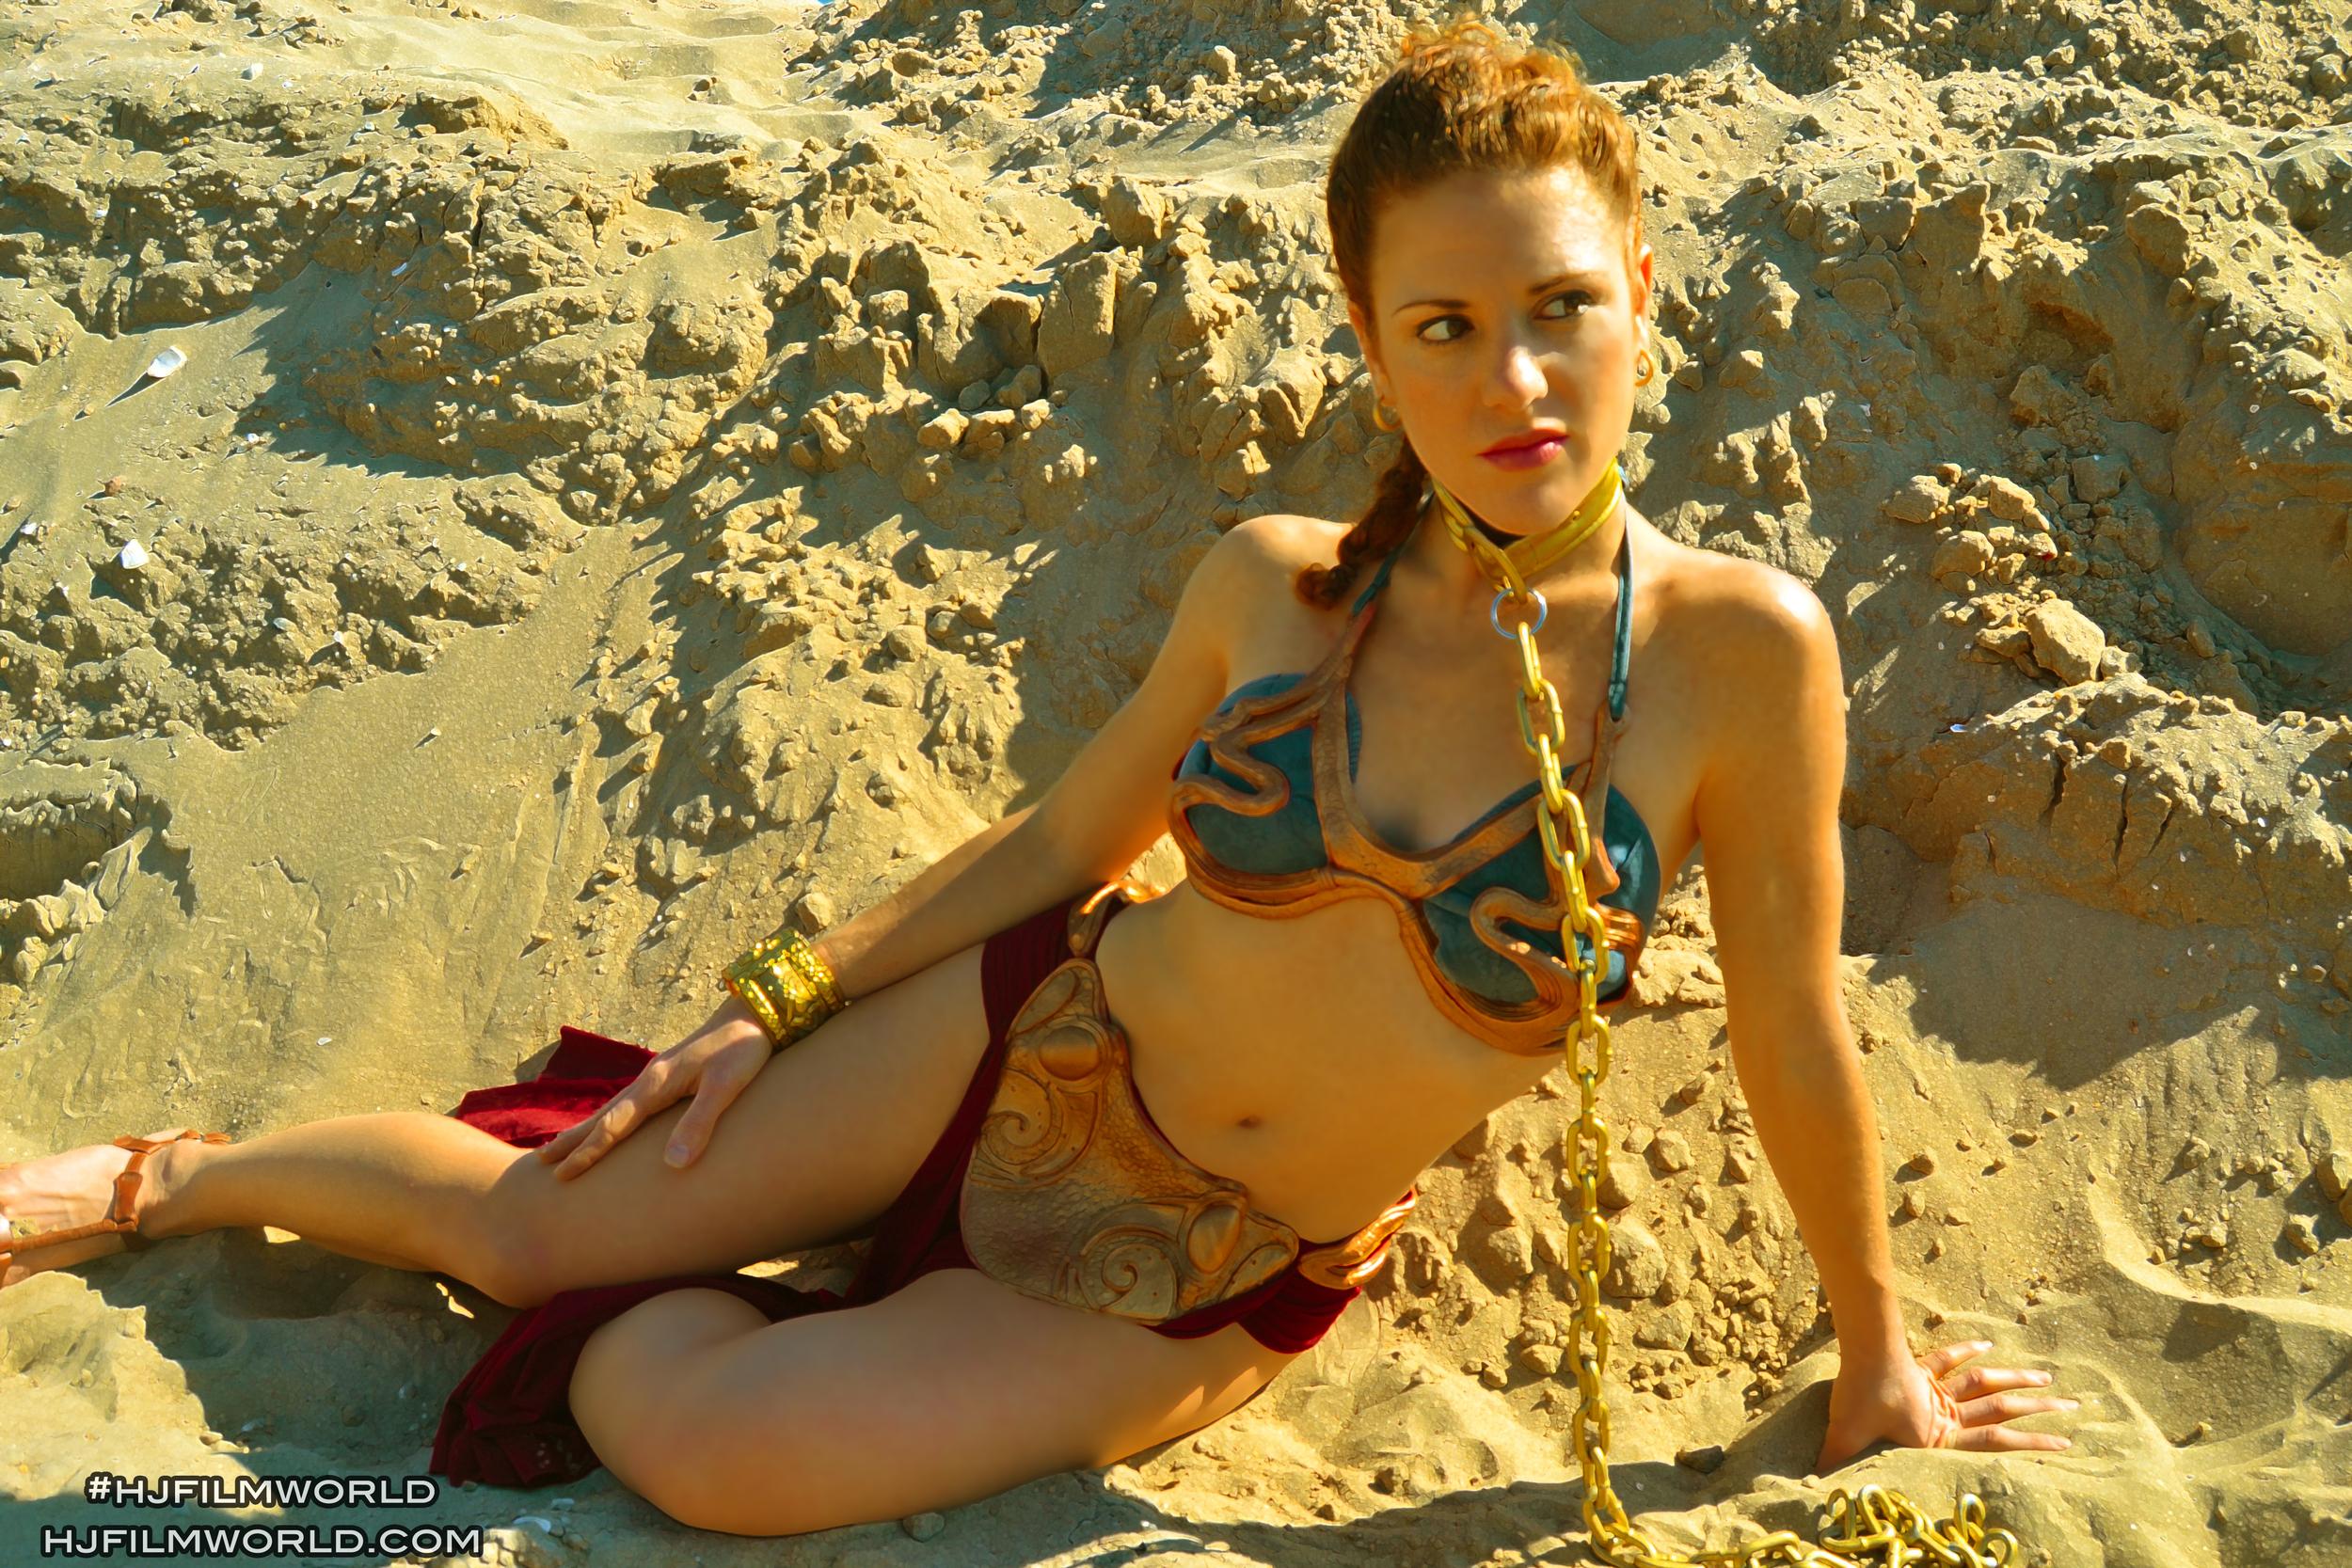 Model: Solange Prat